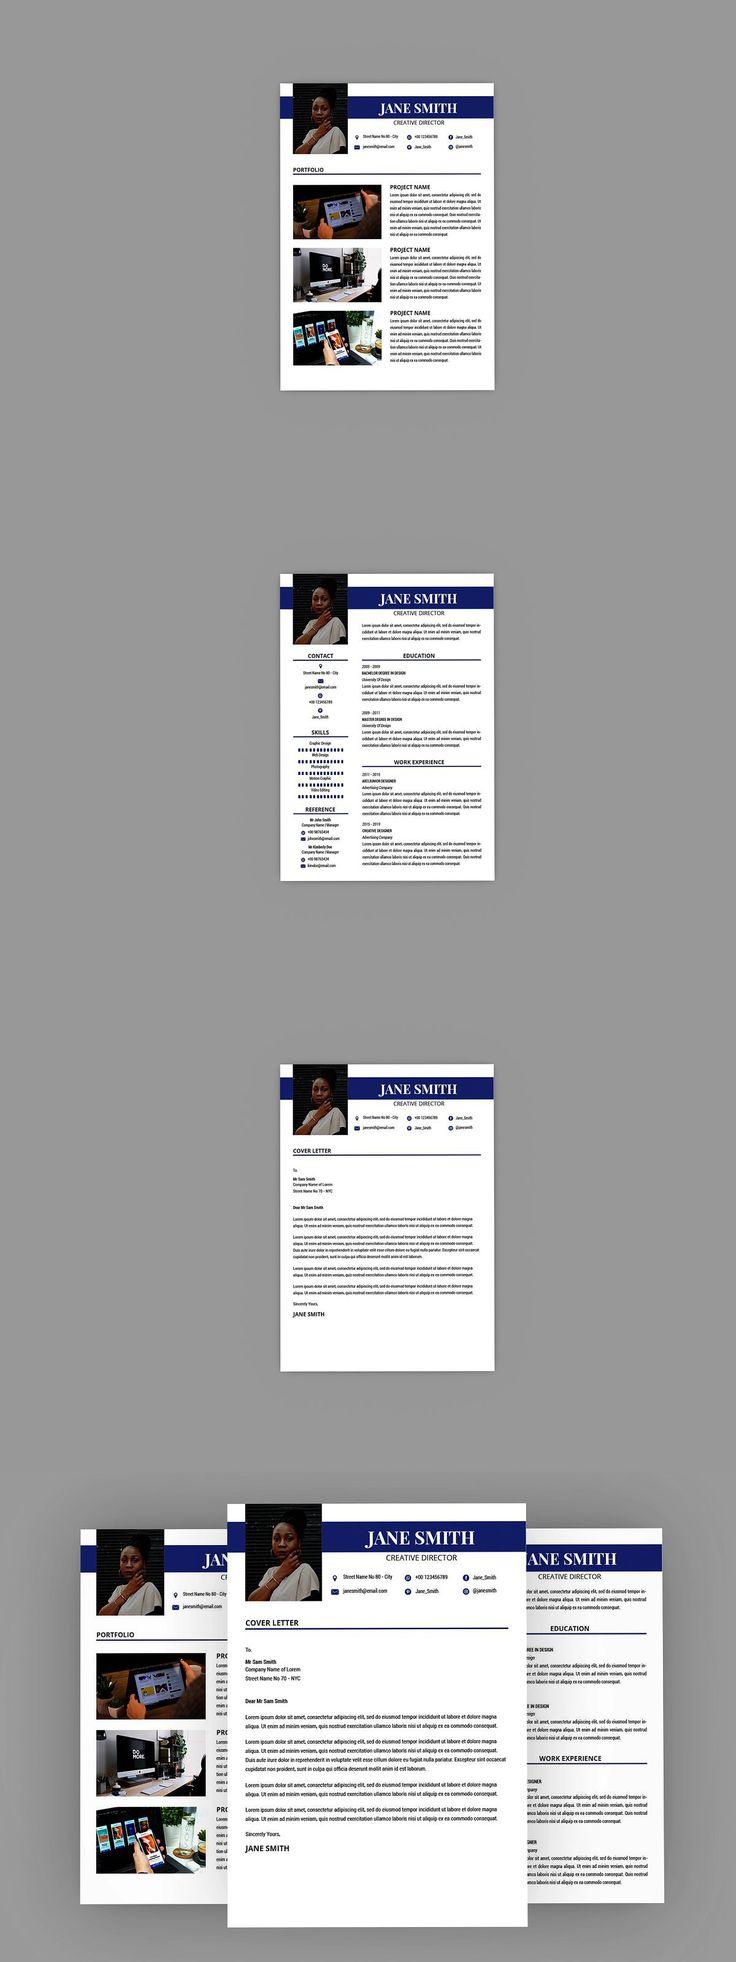 Scarce Resume Designer Resume, Design, Paper template